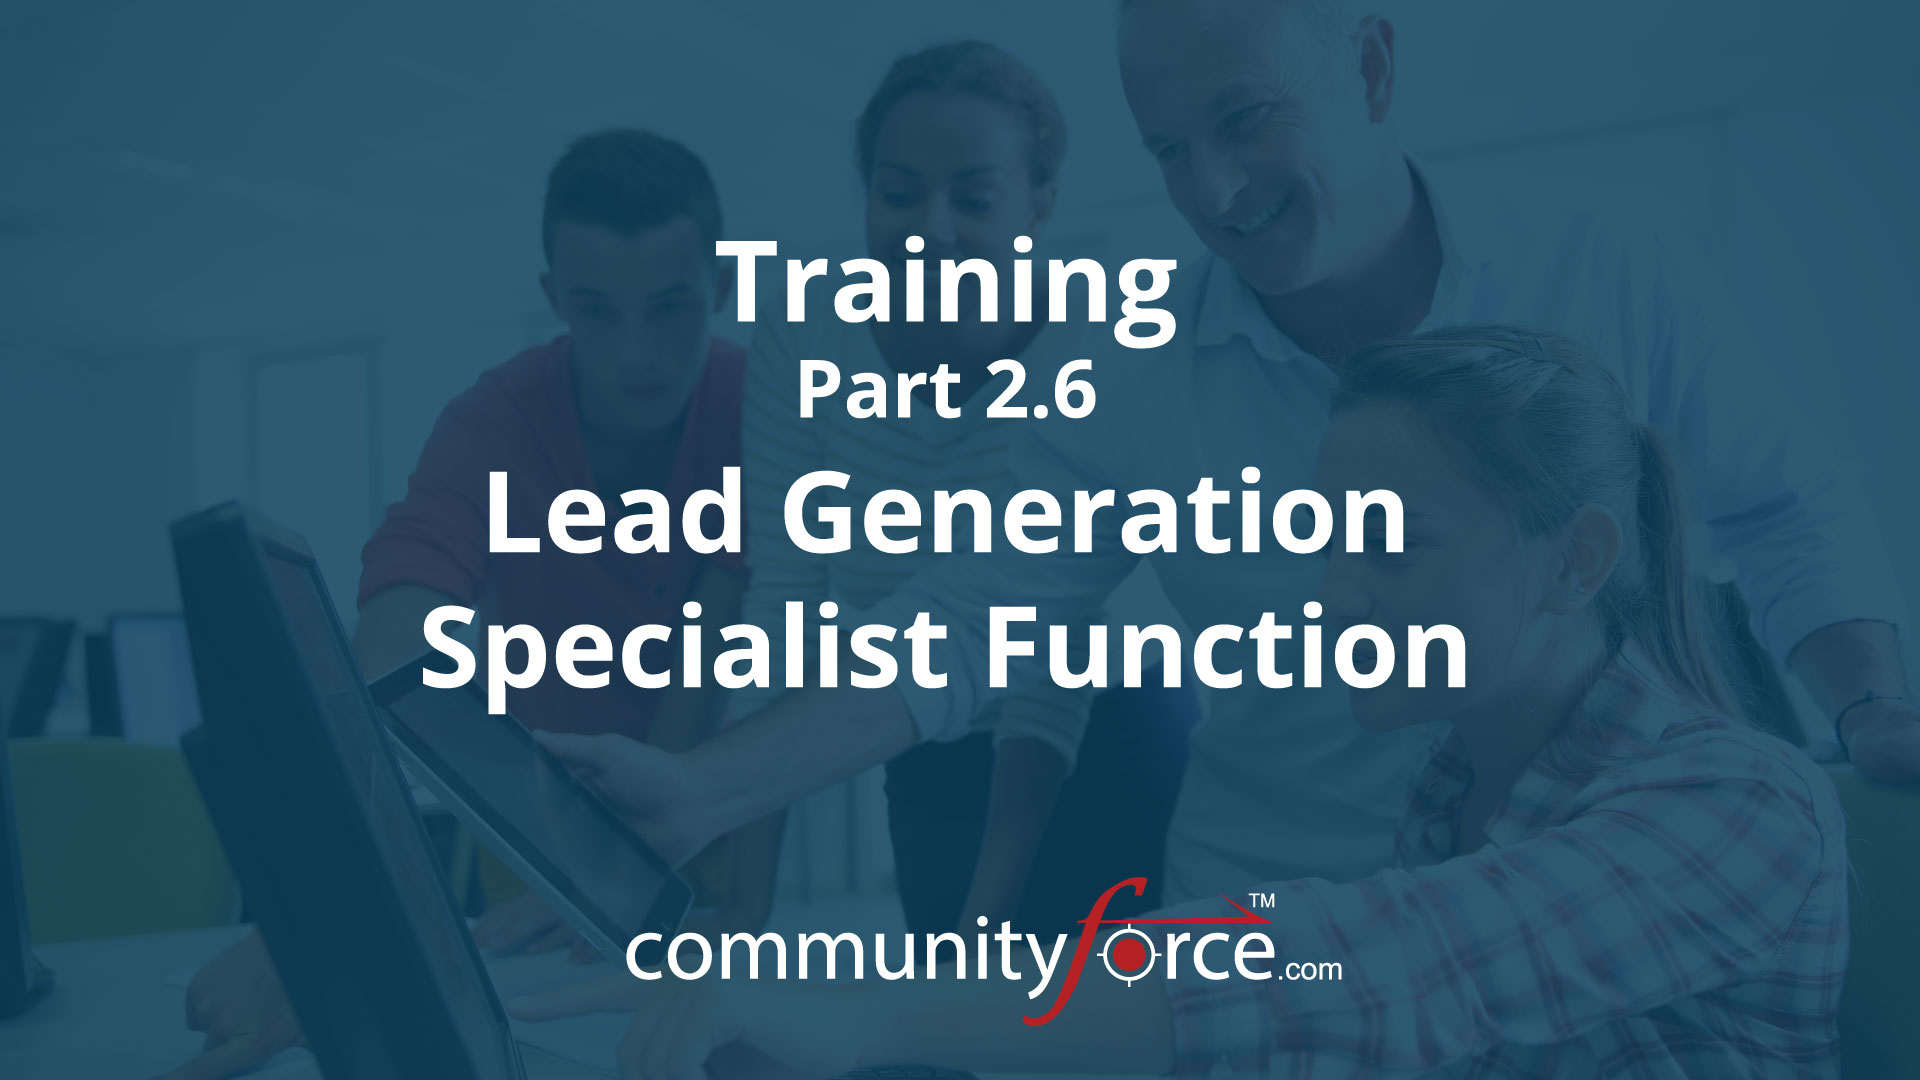 CF LF1 Training Part 2 6 Lead Generation Specialist Function